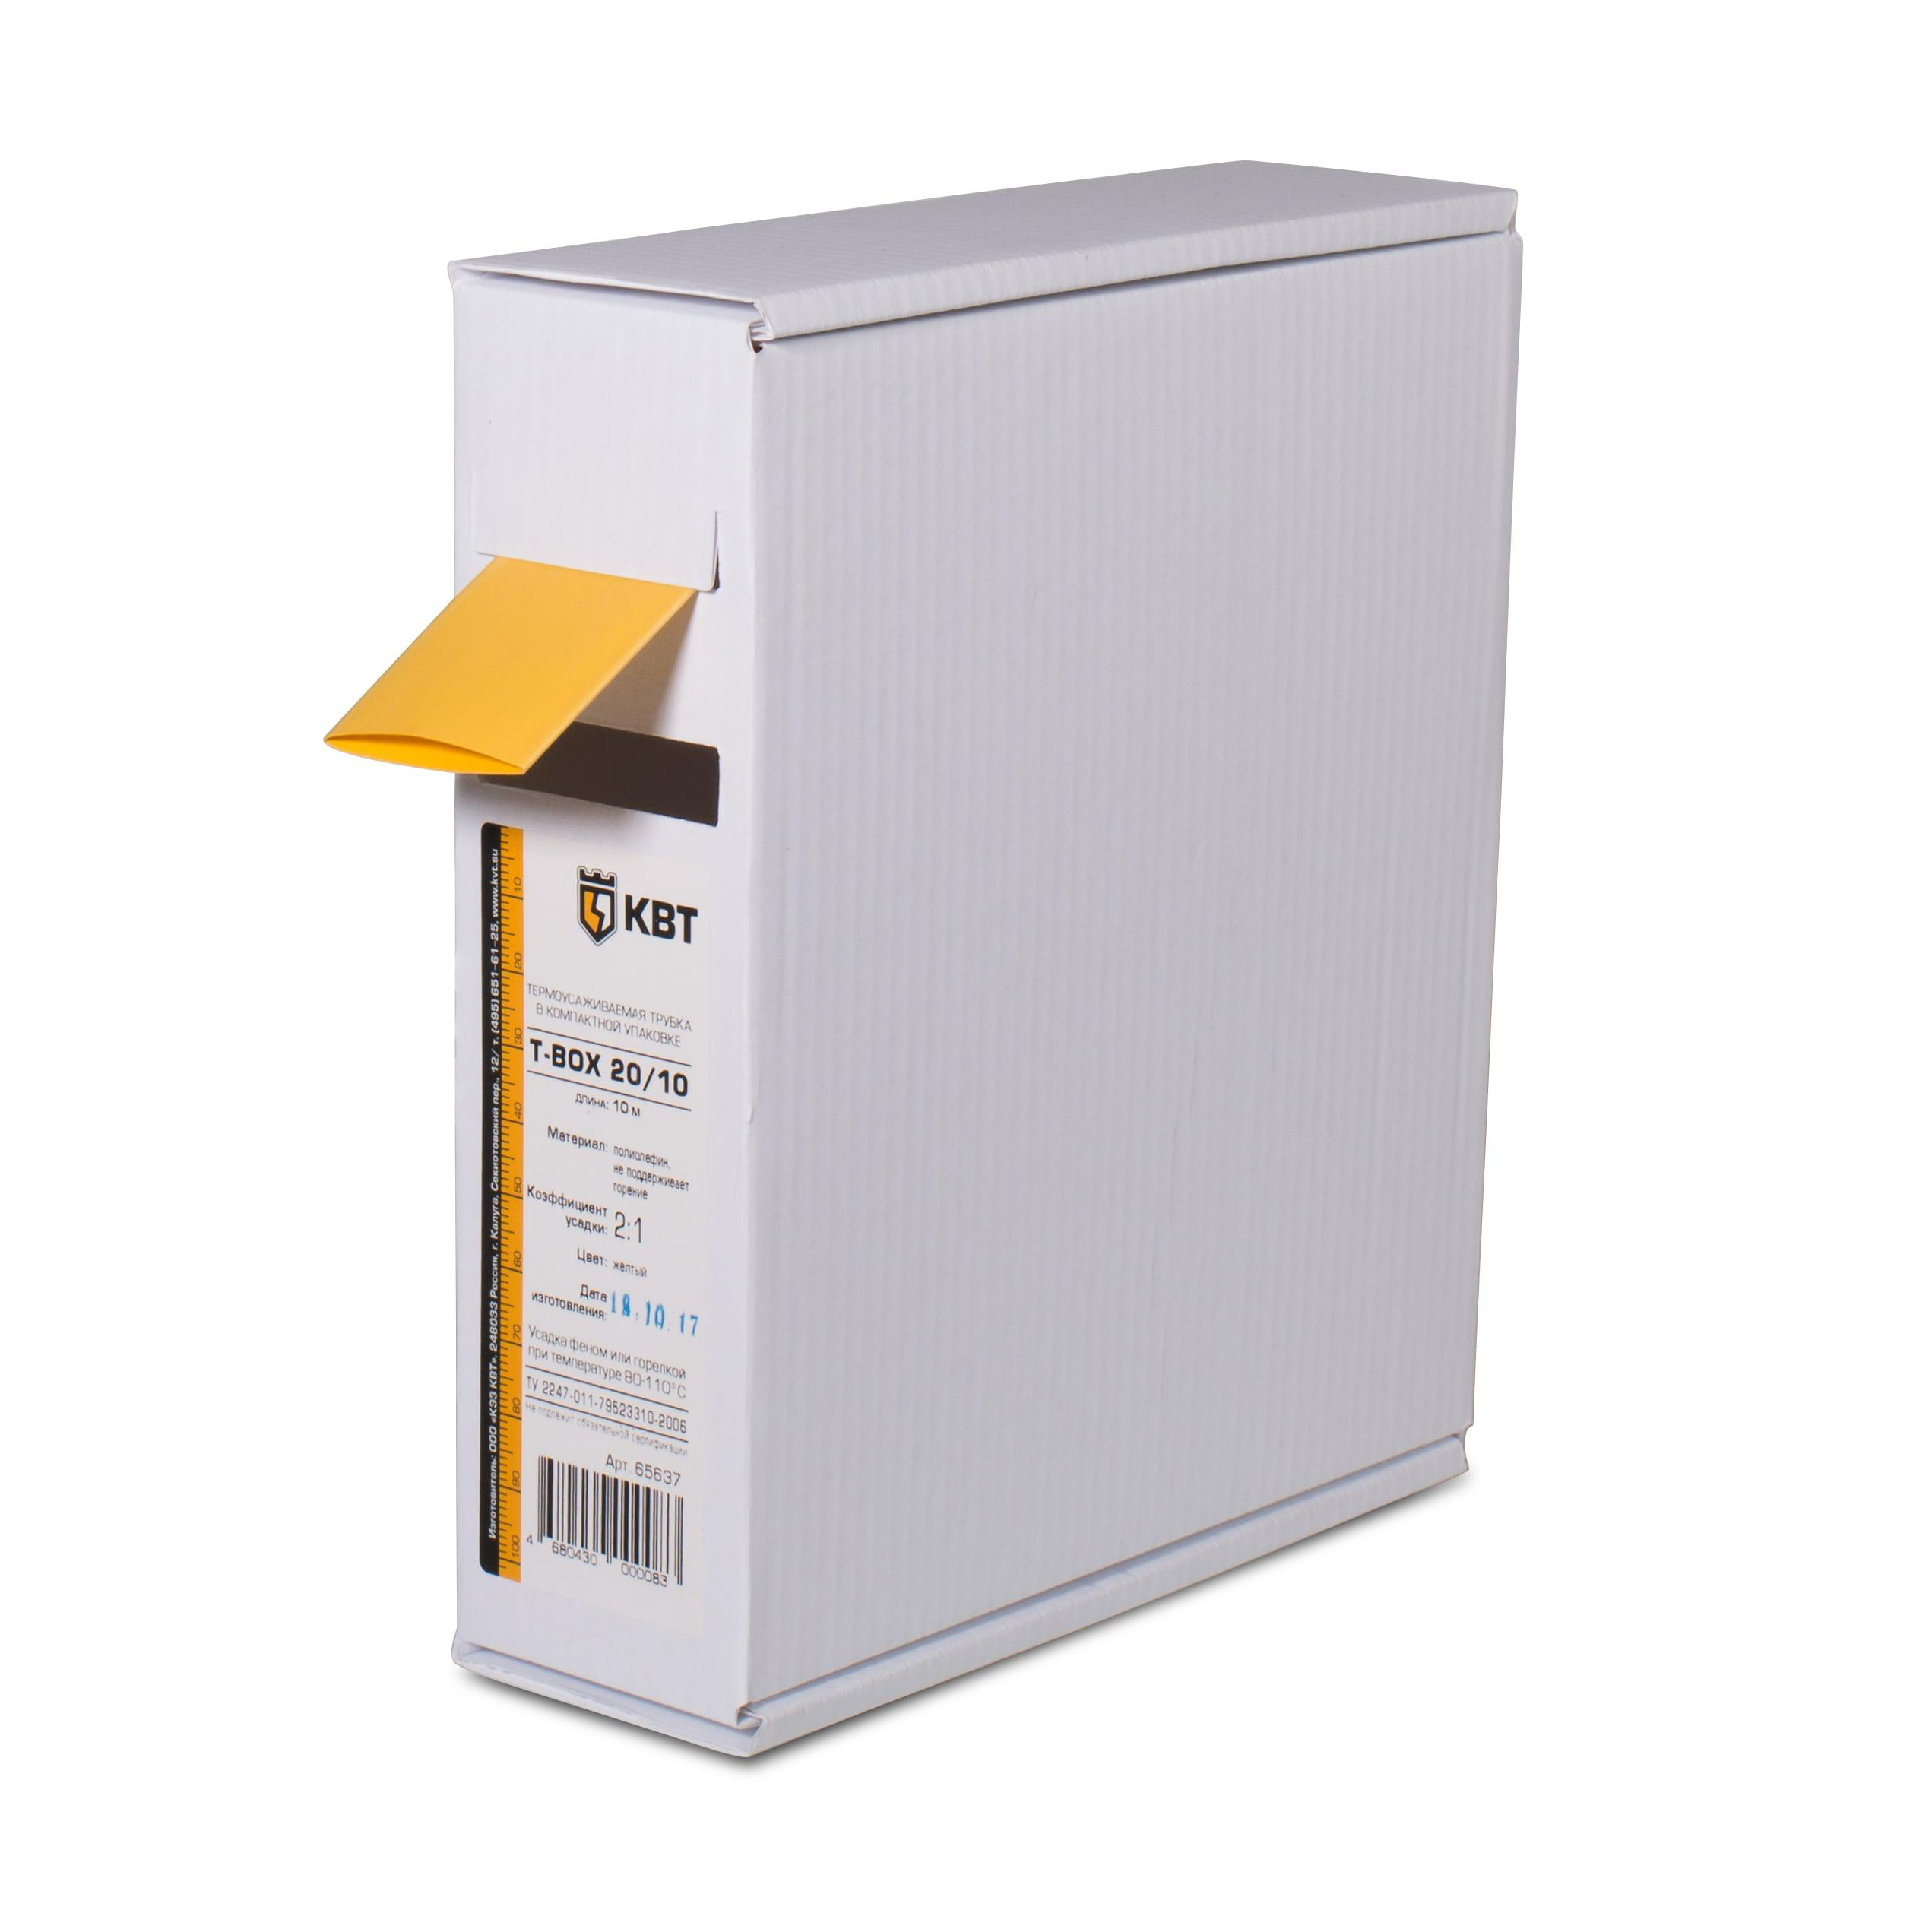 Термоусадочная трубка КВТ Т-box-20/10 желт 10м